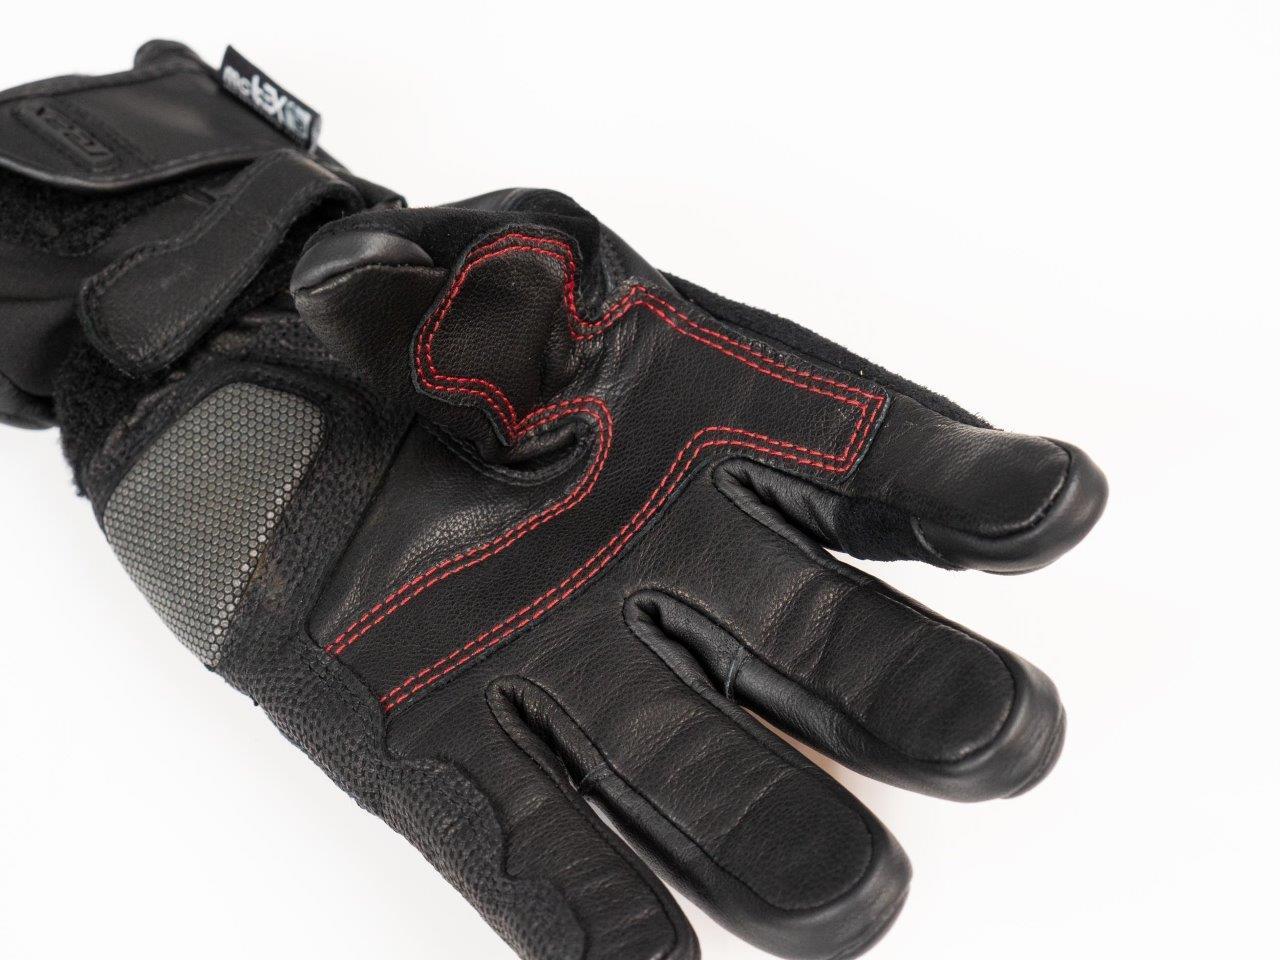 REAX Ridge Waterproof Gloves closeup of fingertips material